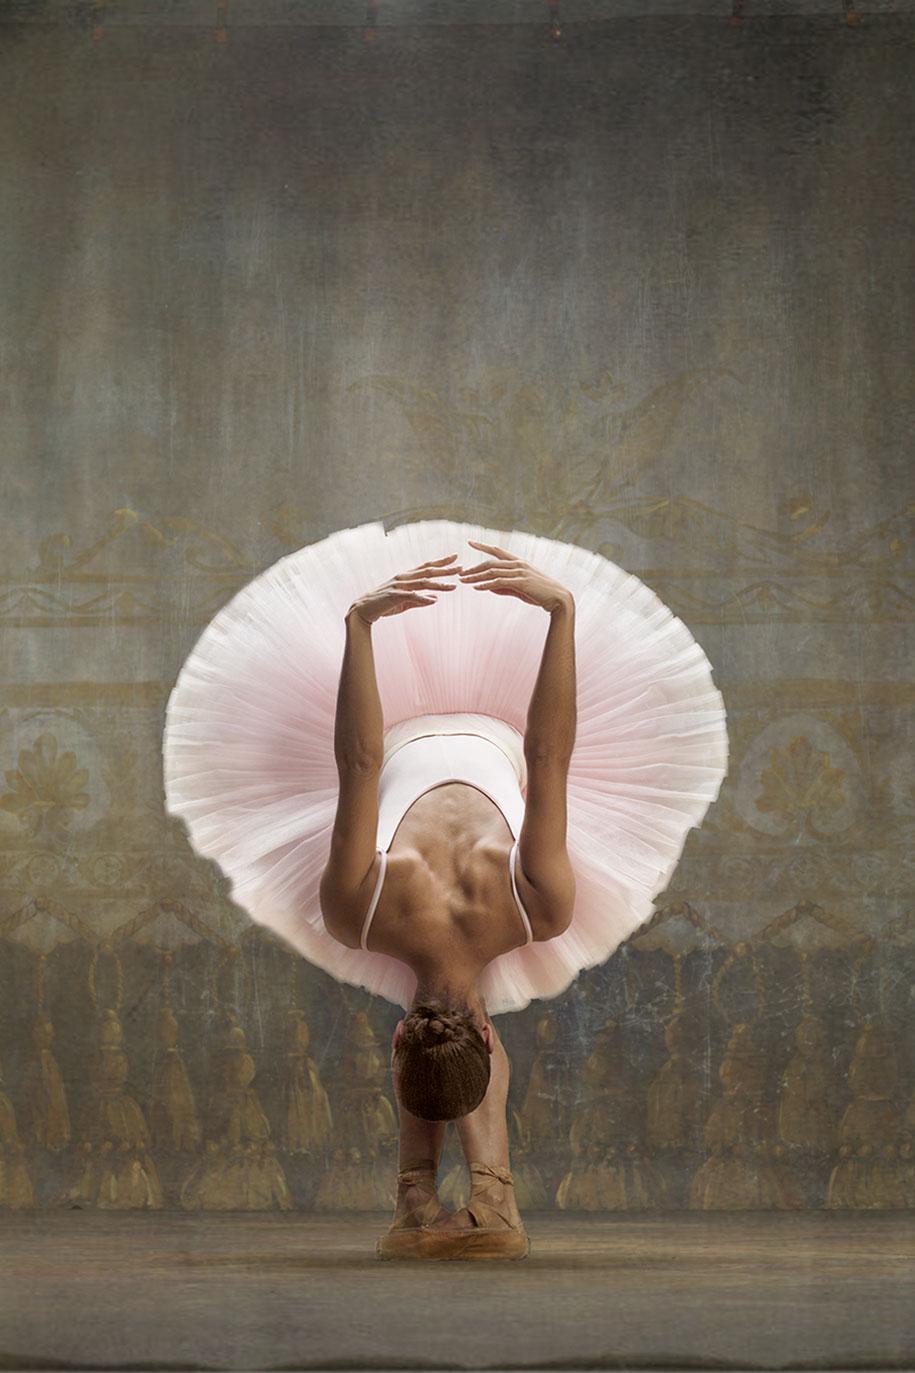 edgar-degas-ballet-dancer-painting-photoshoot-misty-copeland-harpers-bazaar-8